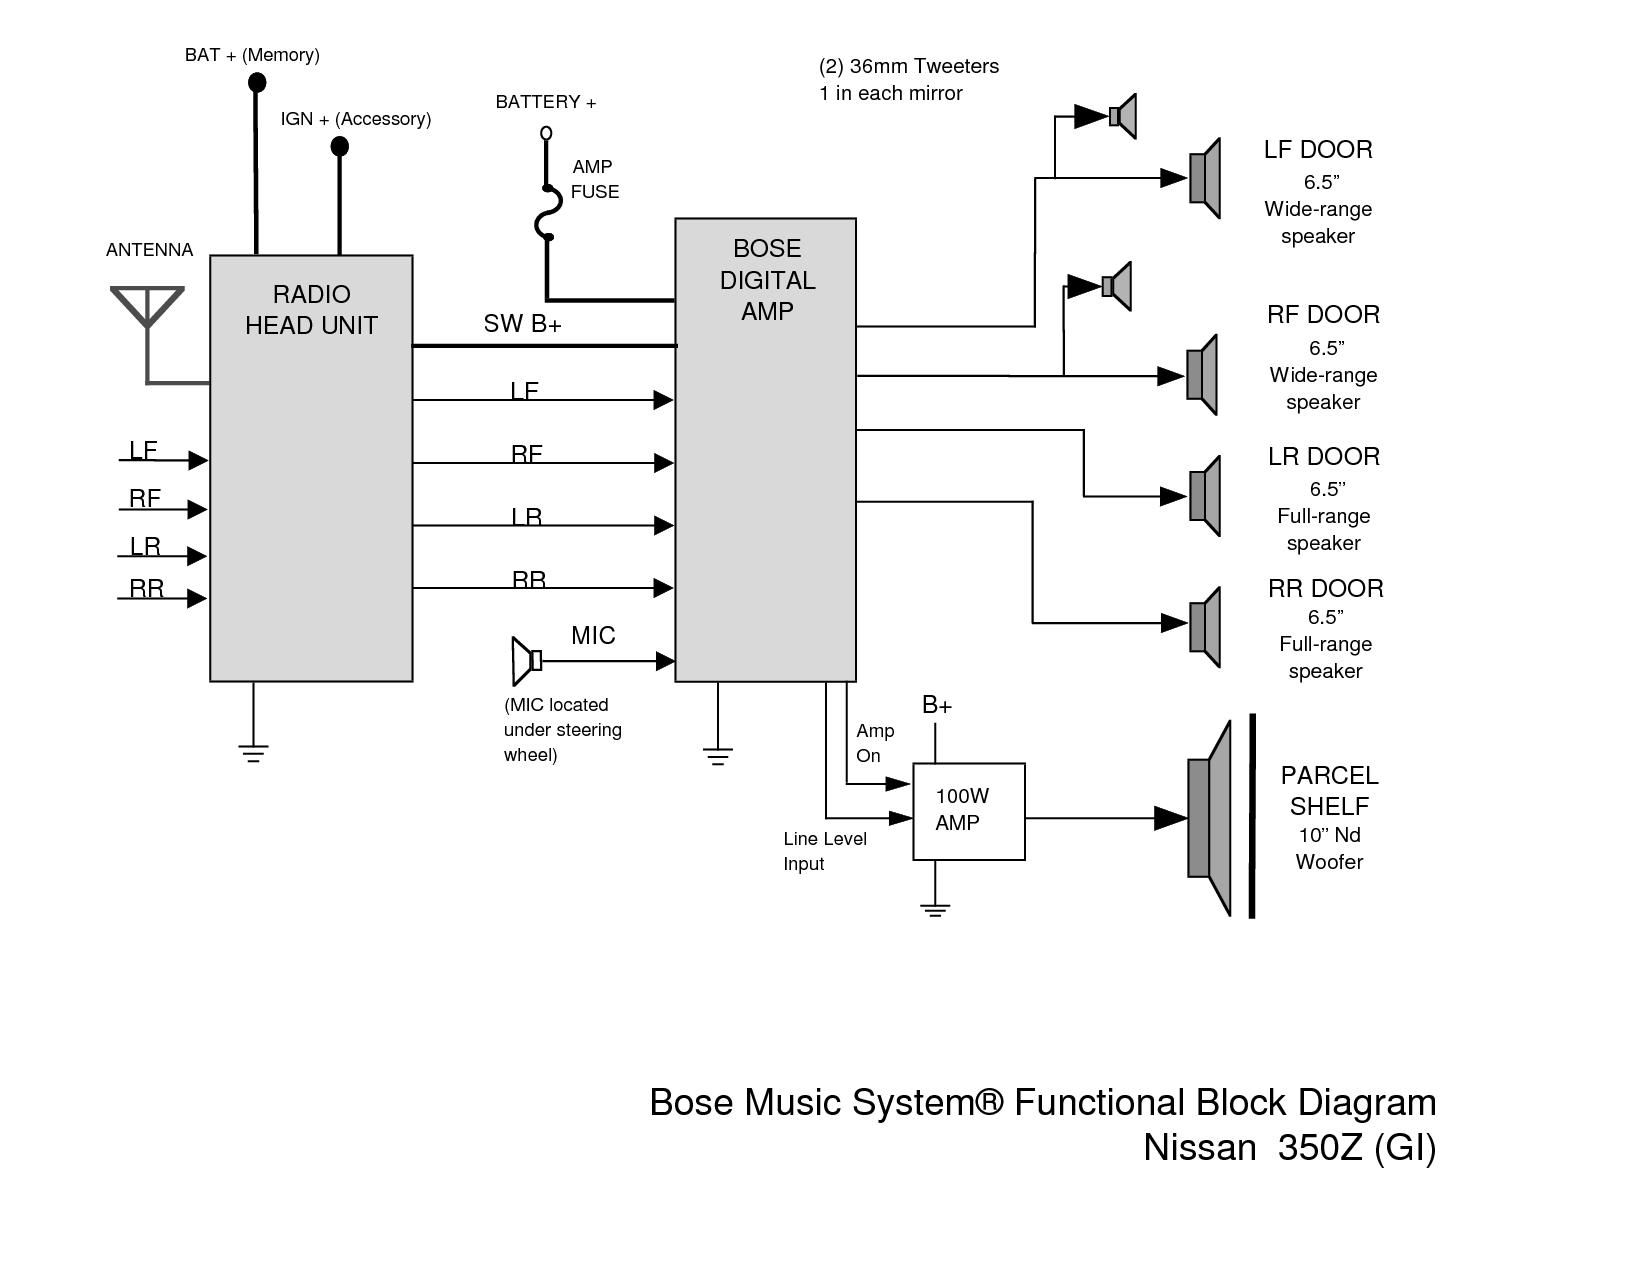 362605d1396434458 03 bose speakers specs 14915844?resize\=665%2C514 cadillac escalade bose wiring diagram infiniti m37 bose wiring audi bose wire diagram at gsmx.co